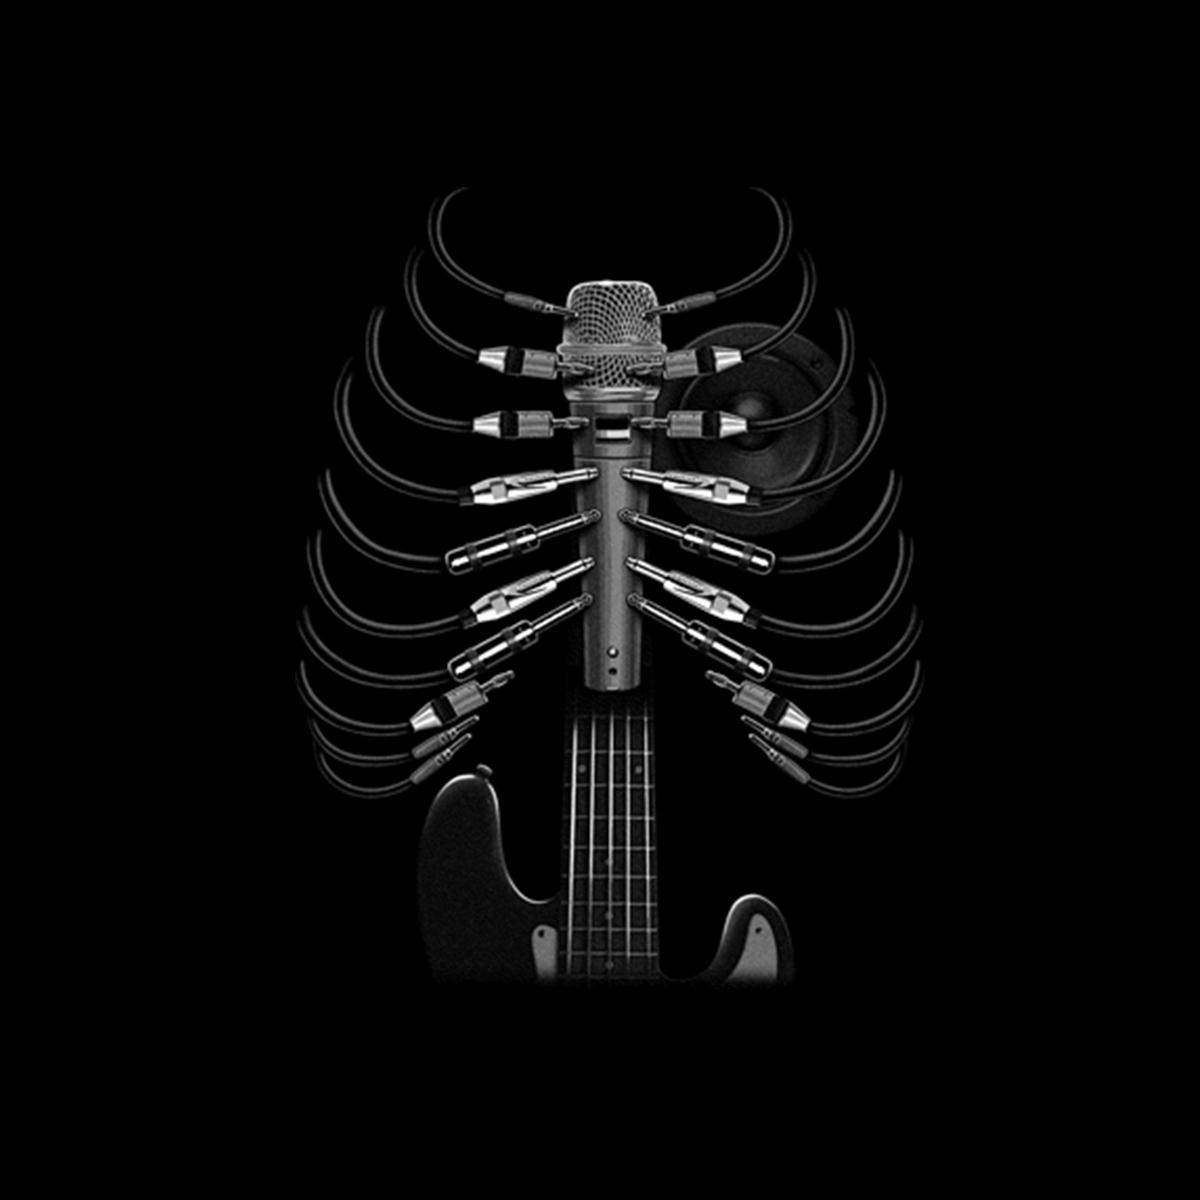 Amped Up Guitar Men T-shirt XS-5XL